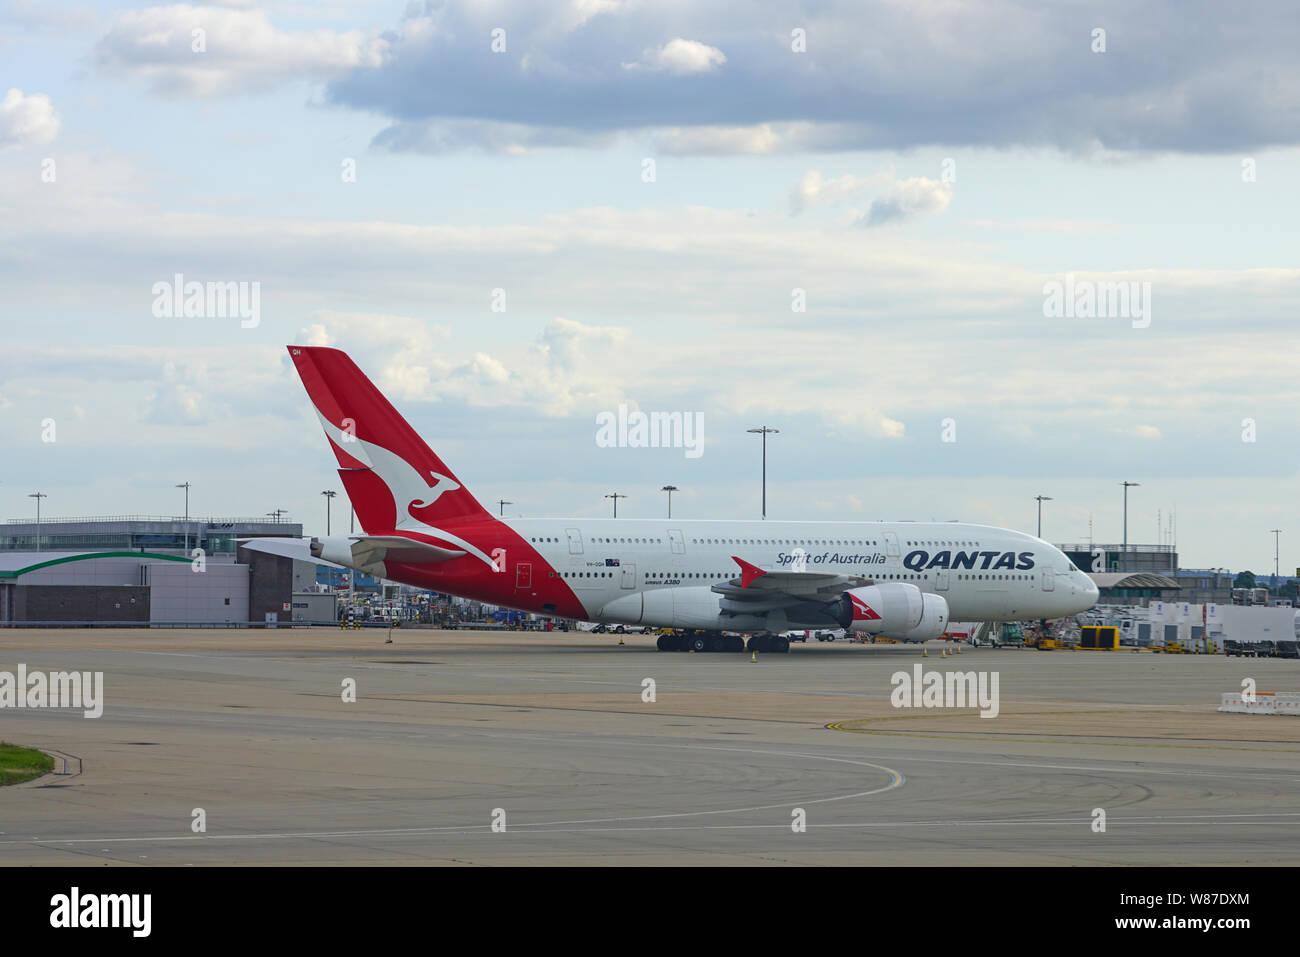 HEATHROW, ENGLAND -28 JUL 2019- View of an Airbus A380 airplane from Australian airline Qantas (QF), Spirit of Australia, at London Heathrow Airport ( Stock Photo